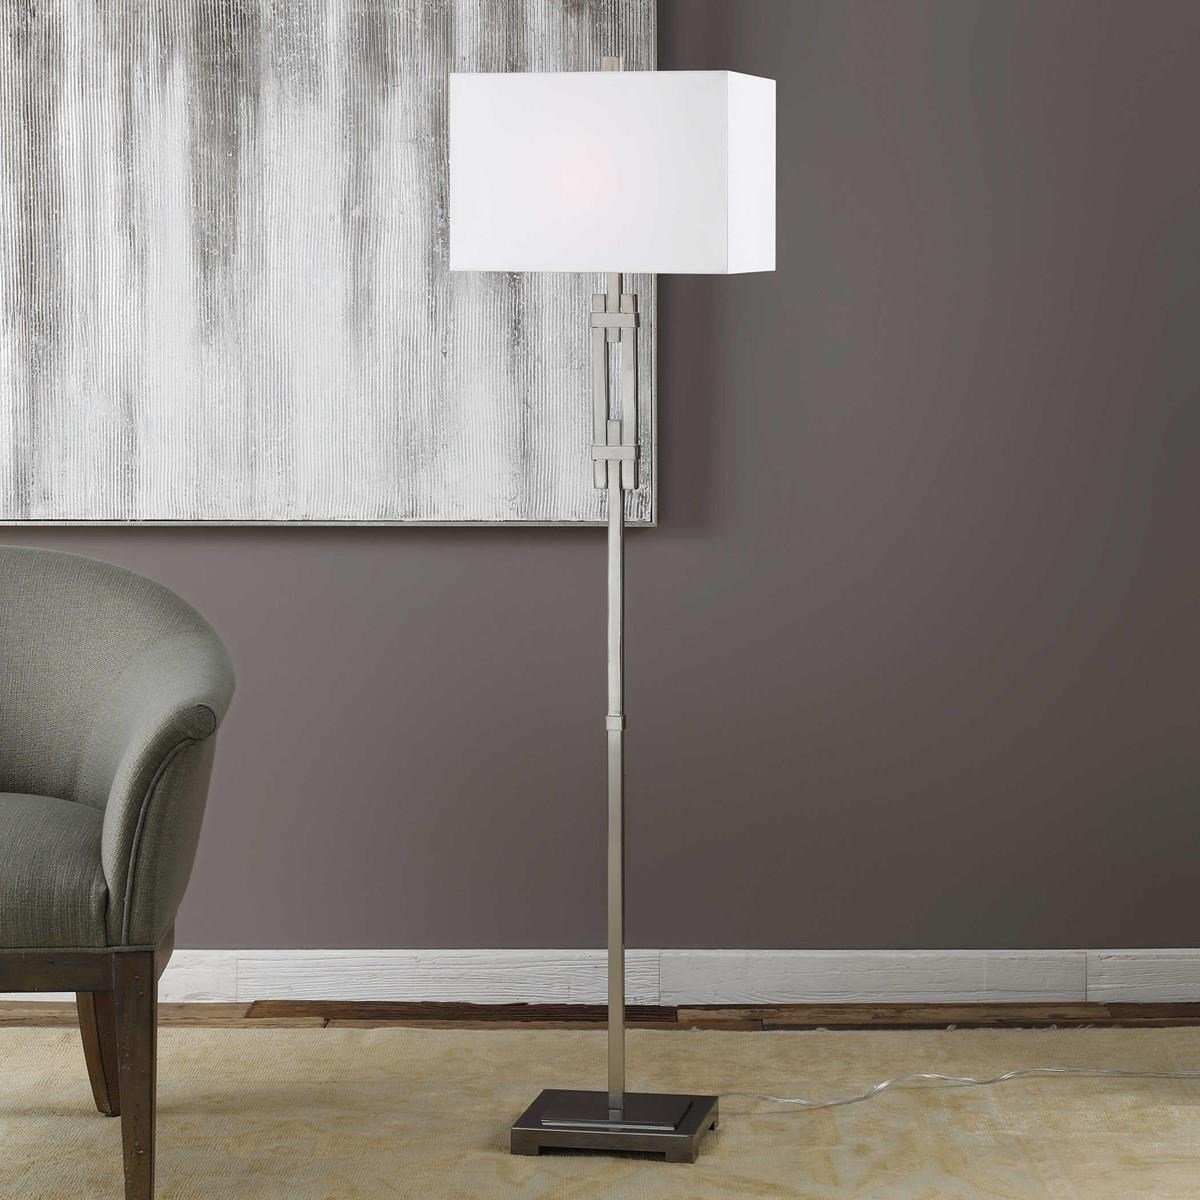 Floor Lamps LEILANI FLOOR LAMP by Unique at Walker's Furniture